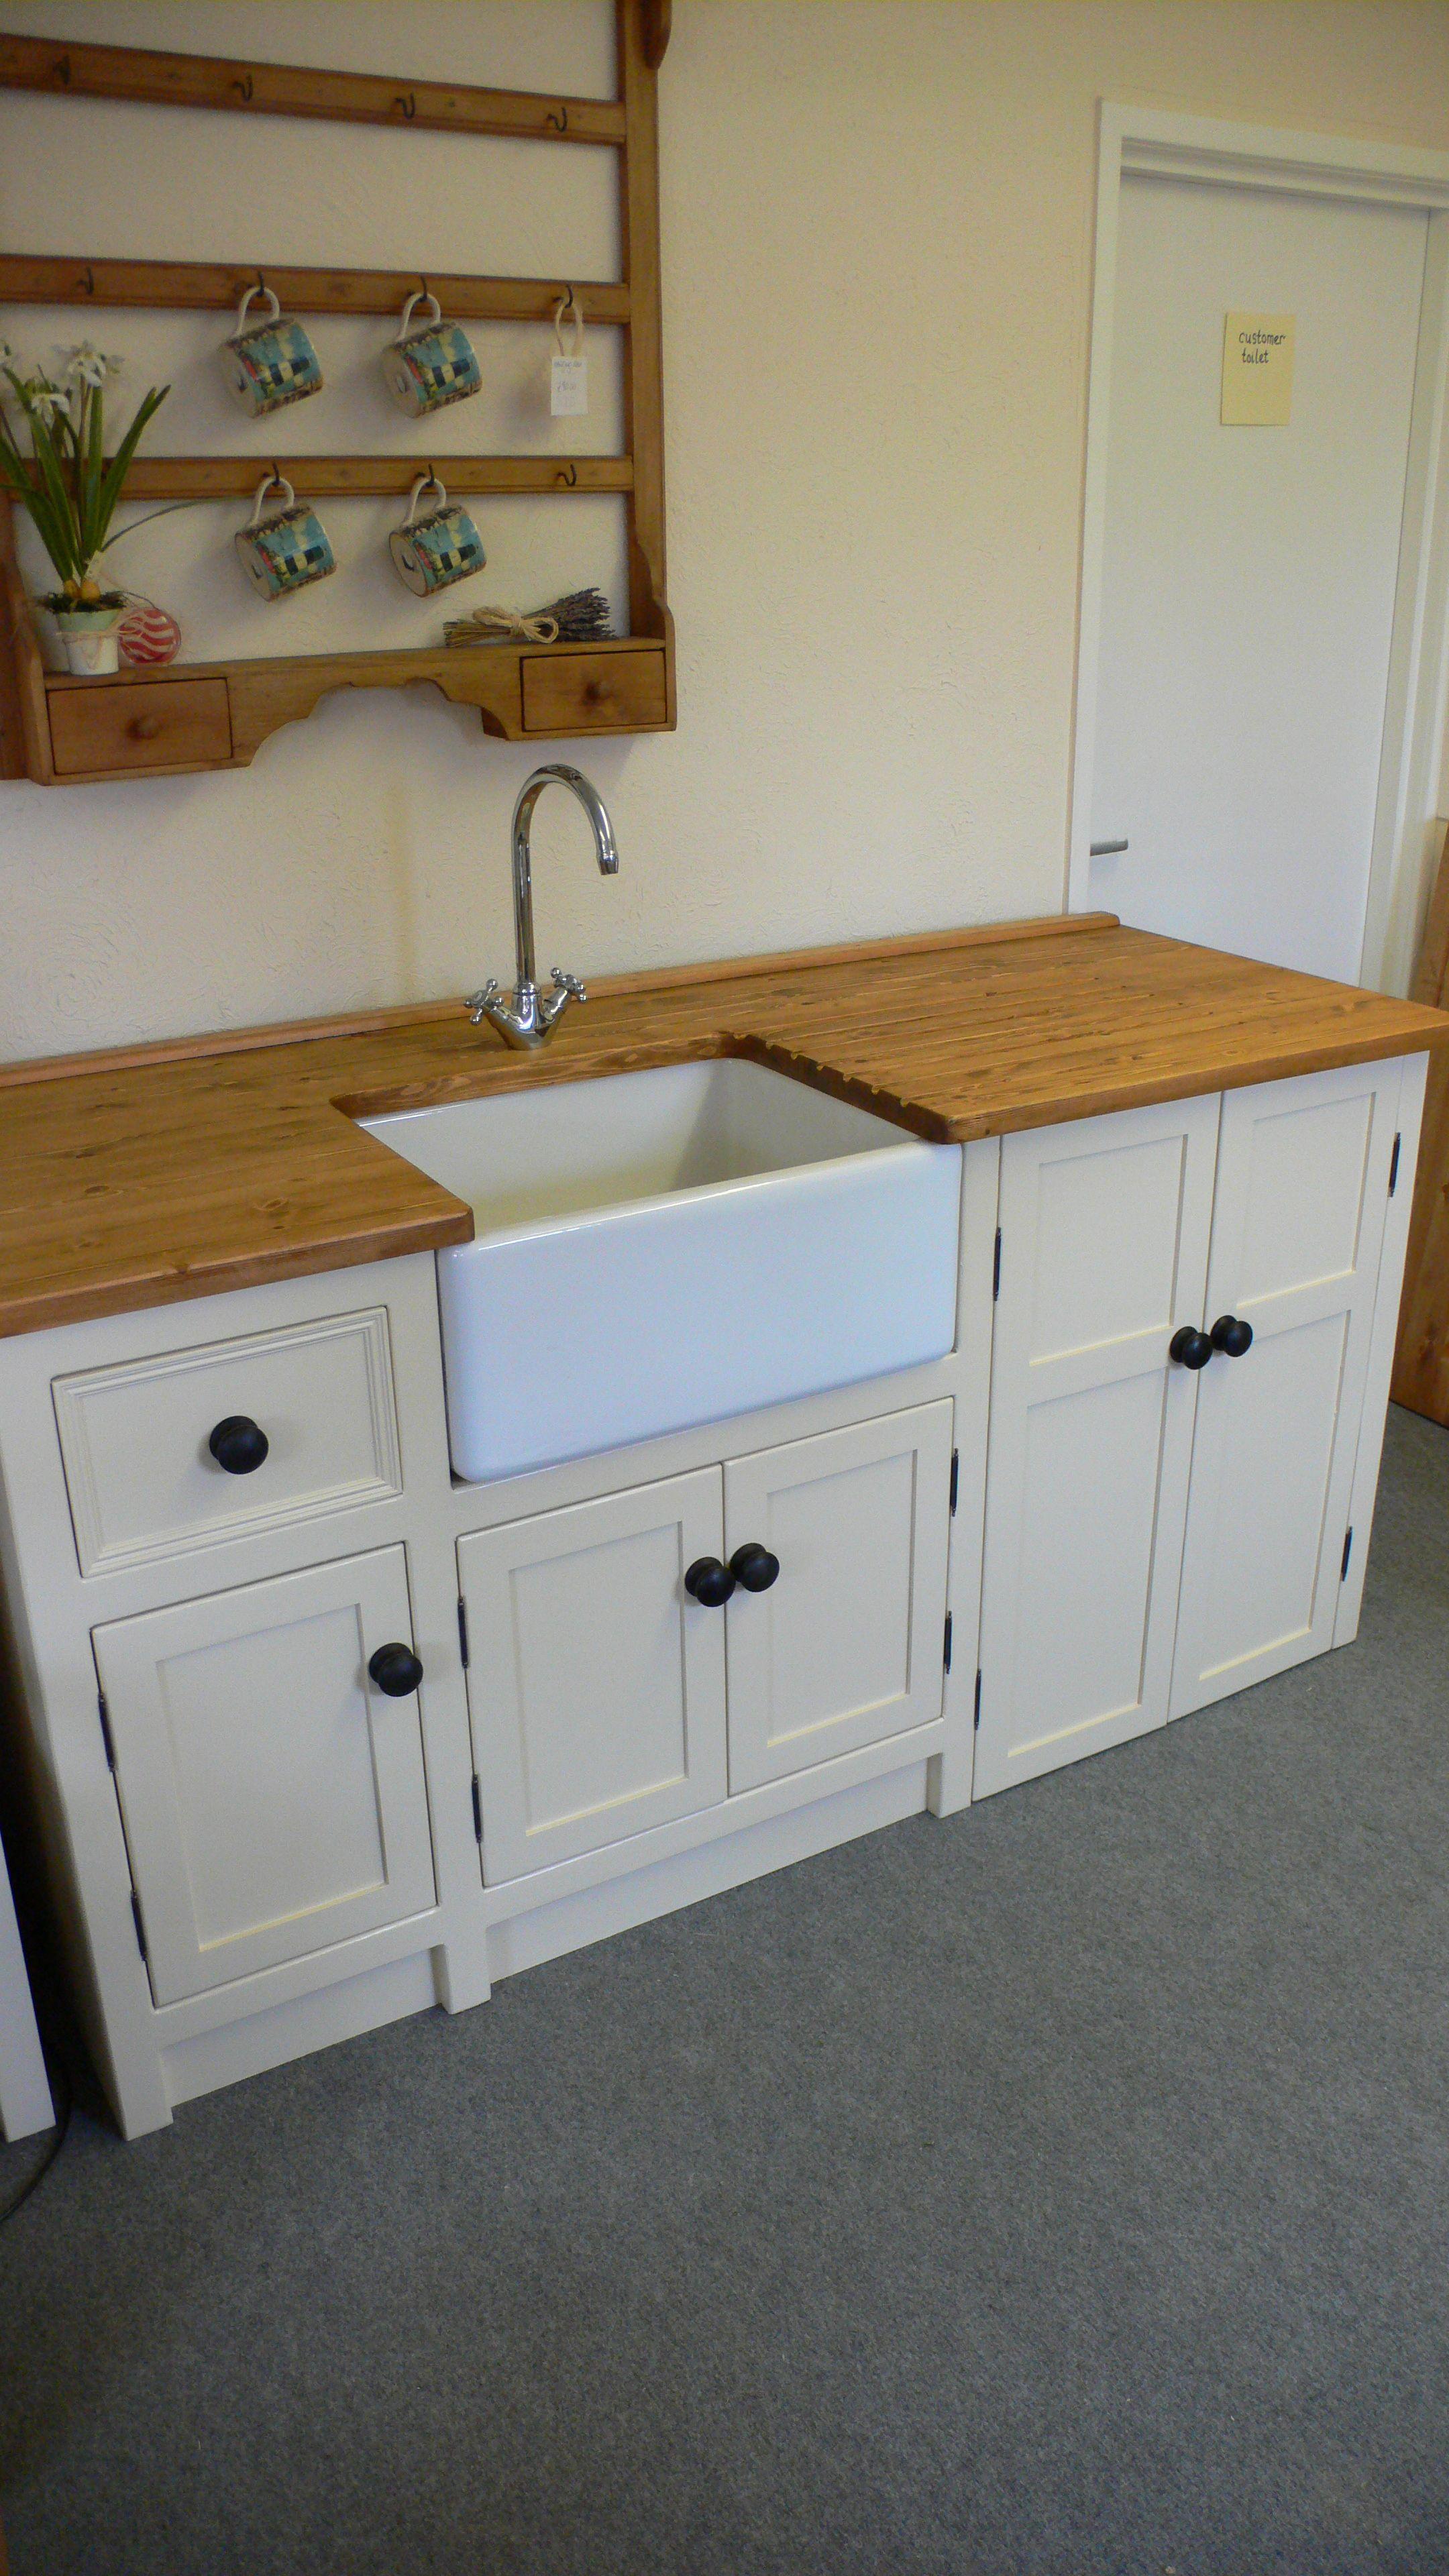 Belfast Sink Unit With Freestanding Appliance Cupboard Kitchen Sink Units Freestanding Kitchen Free Standing Kitchen Sink